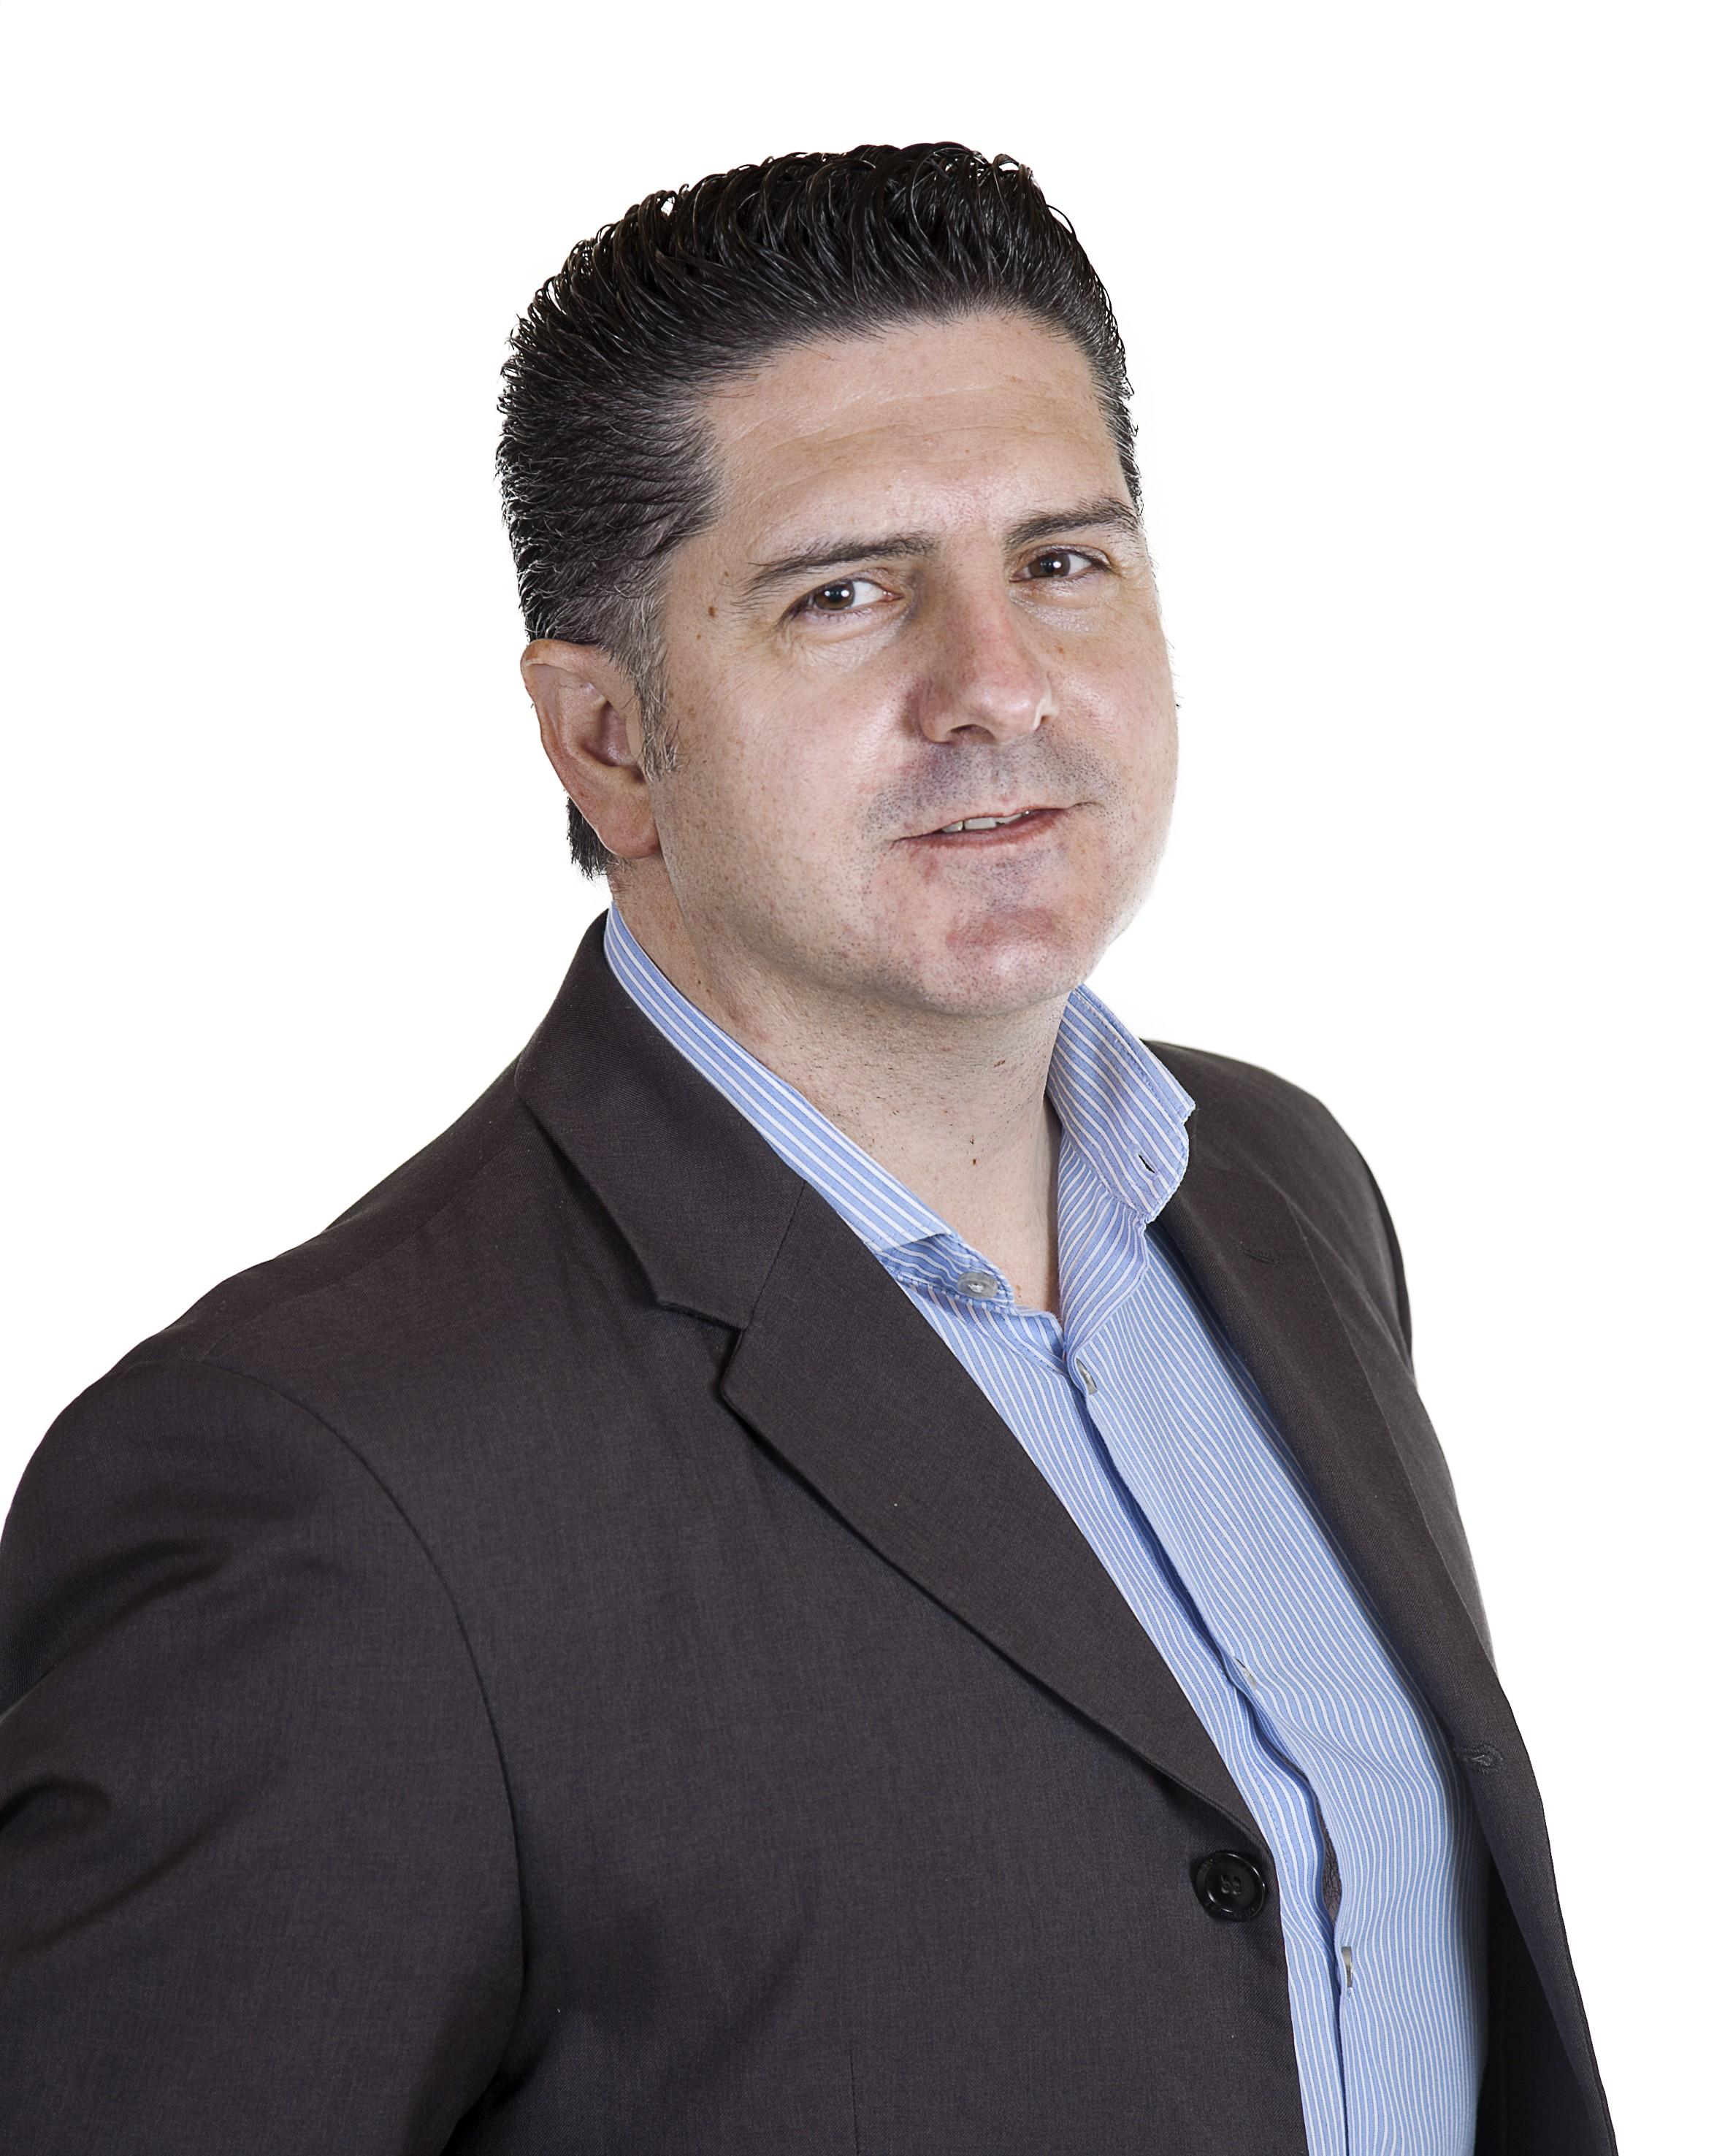 Juan Carlos Duran Gonzalez